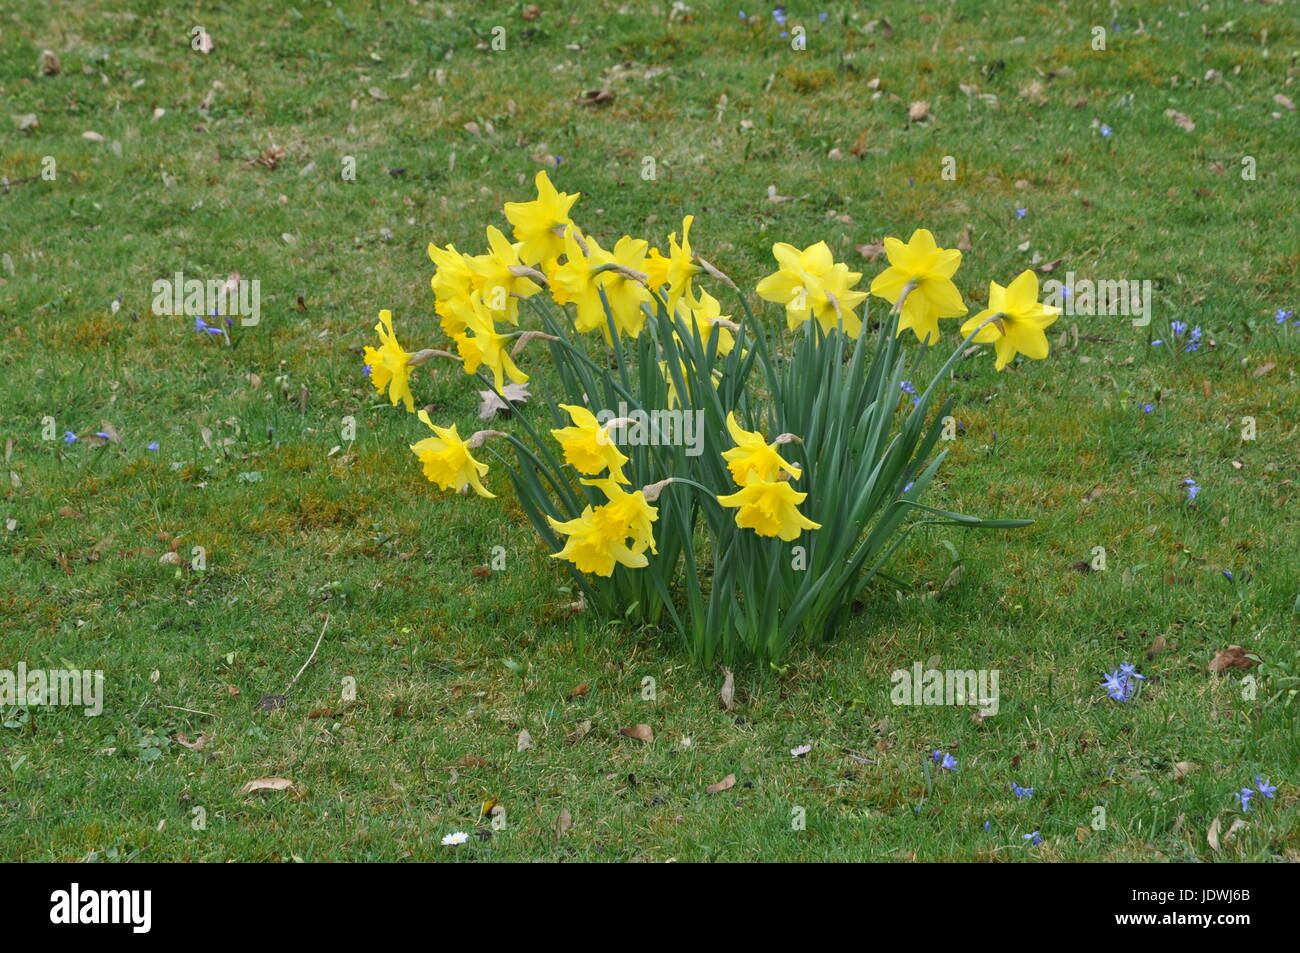 Osterglocke Osterglocken Narzisse Narzissen Blume Blumen Blute